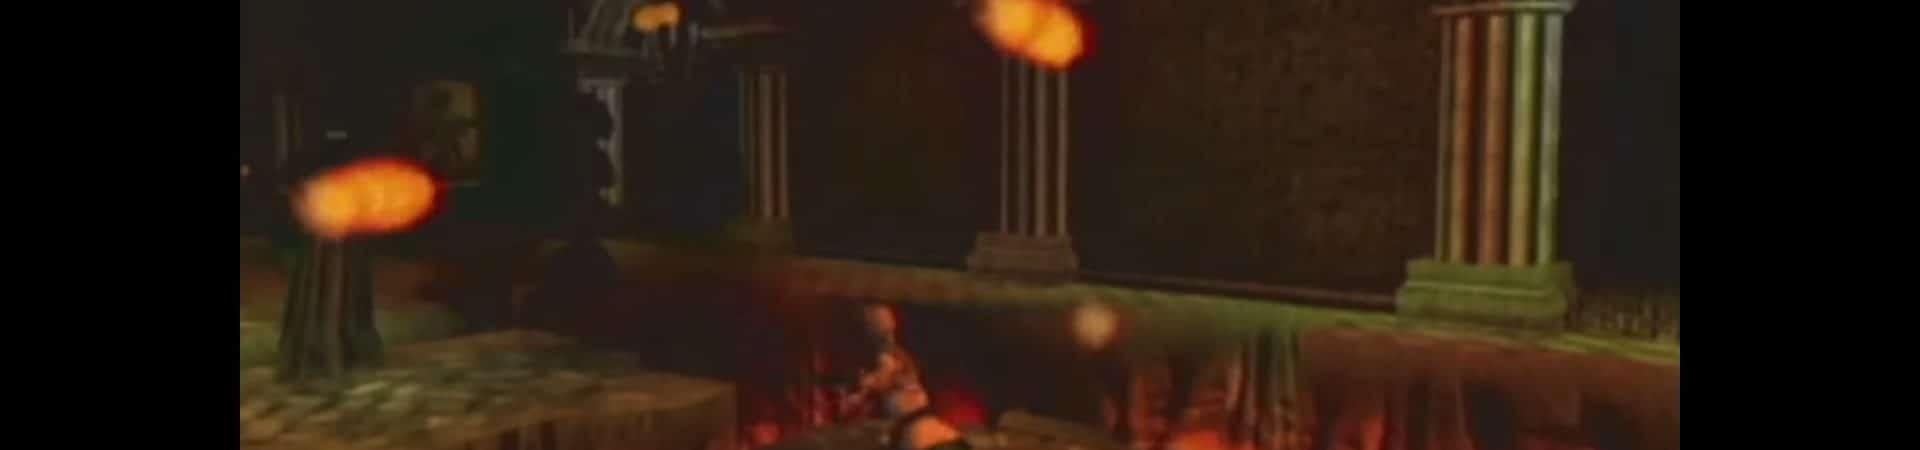 Castlevania Resurrection